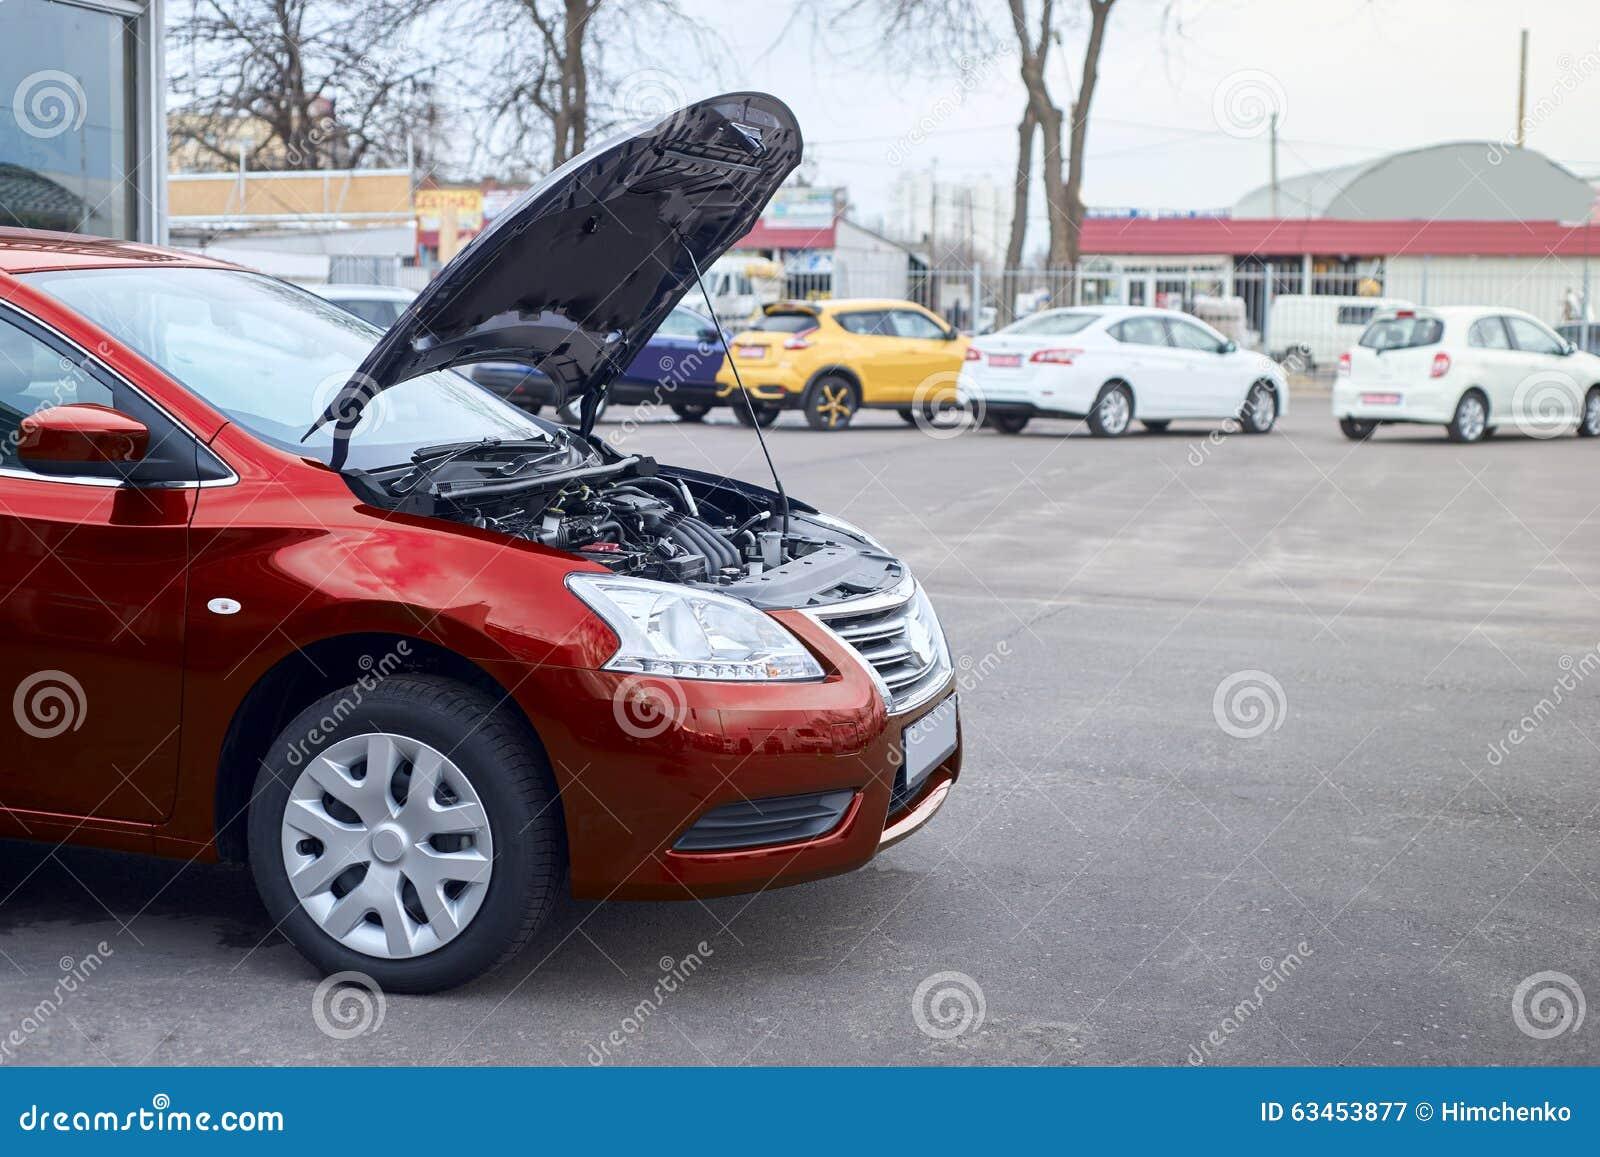 Car Broke Down >> Red Car Broke Down Stock Image Image Of Service Down